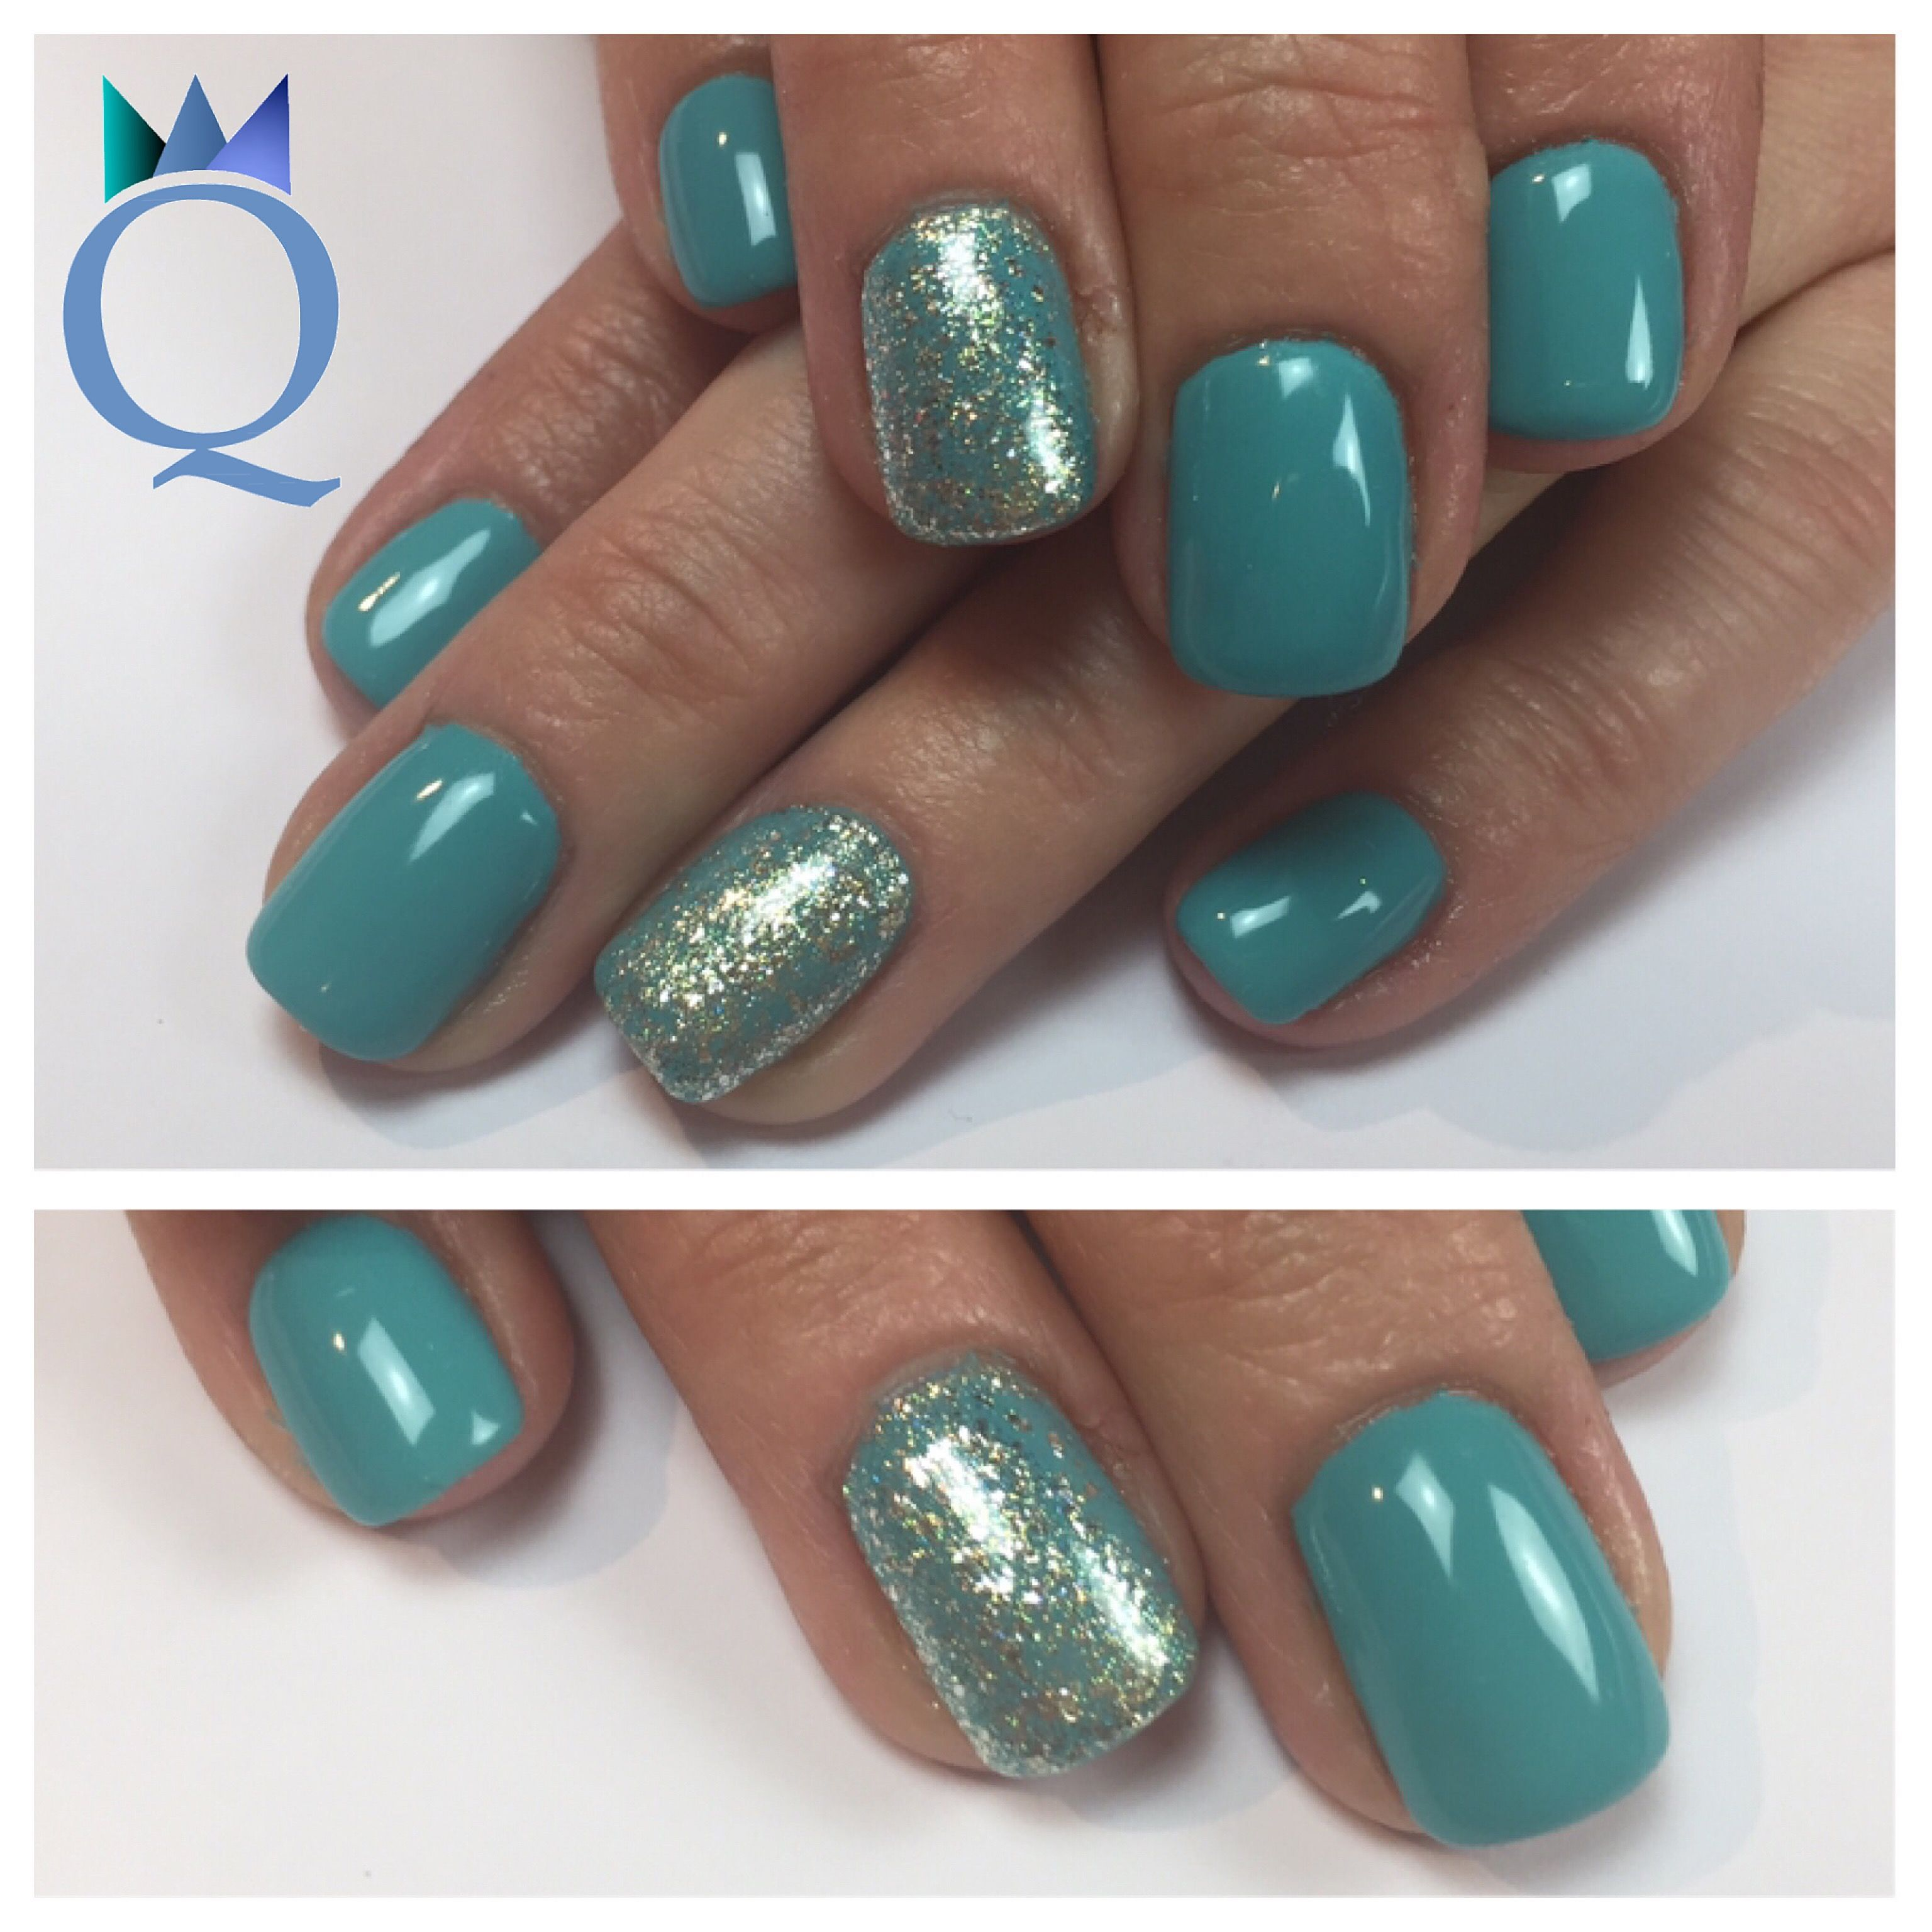 shortnails #gelnails #nails #turquoise #akyado #silver #glitter ...